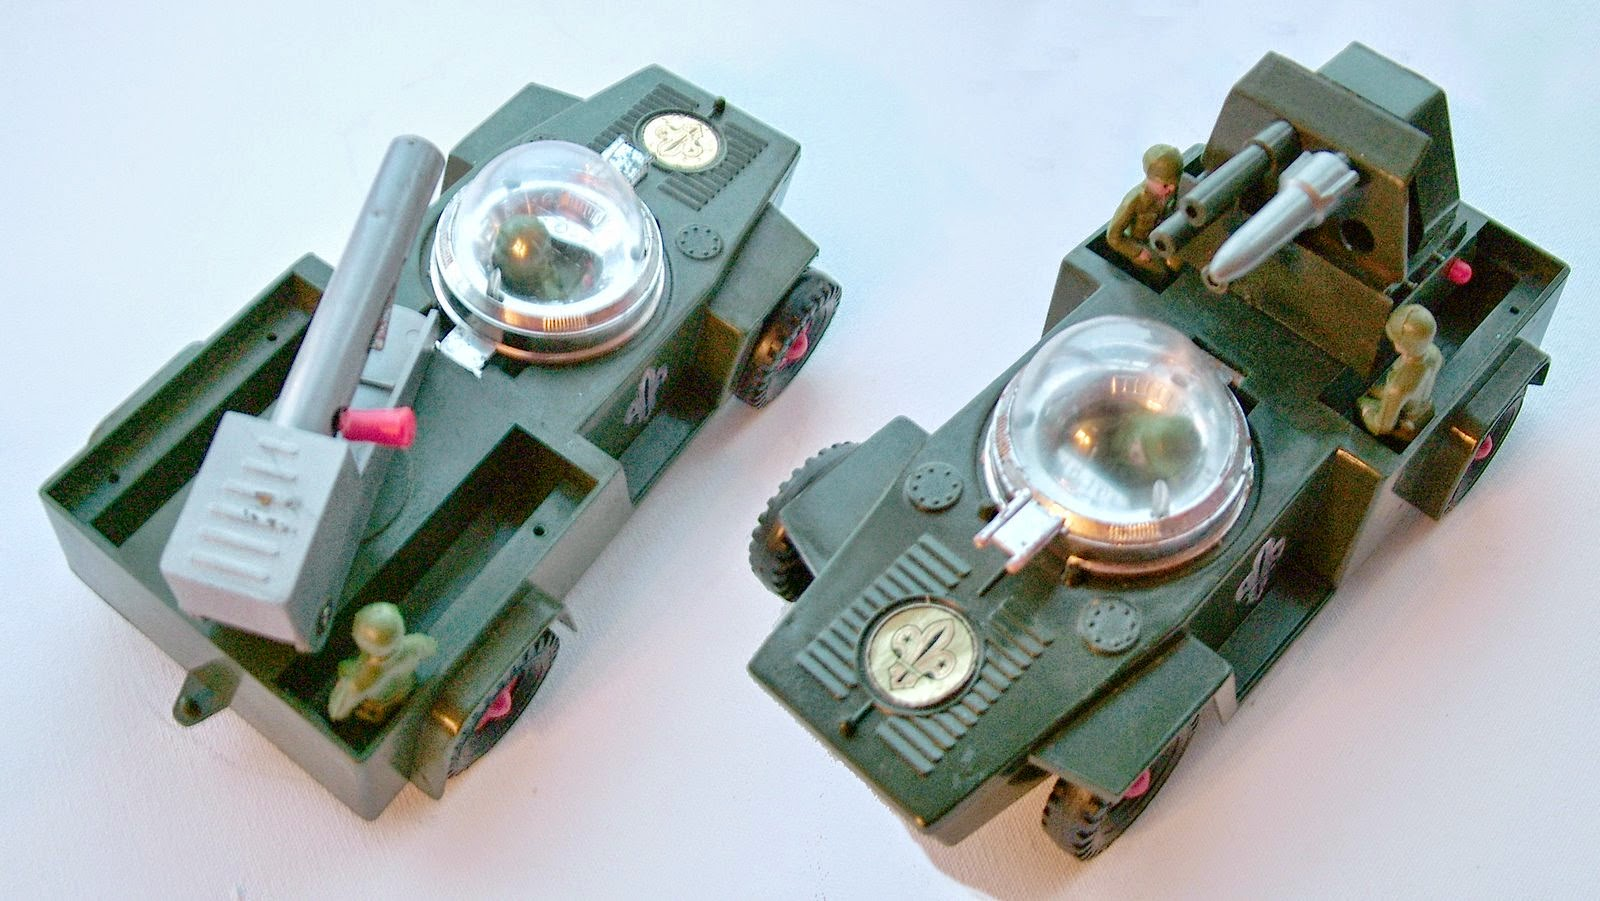 Circuit Boards Recycled Make Santa Happy Technik T Board Clock Black Stones By Debbyaremdesigns Codeg Armoured Firing Car And Spacex Cricket Bill